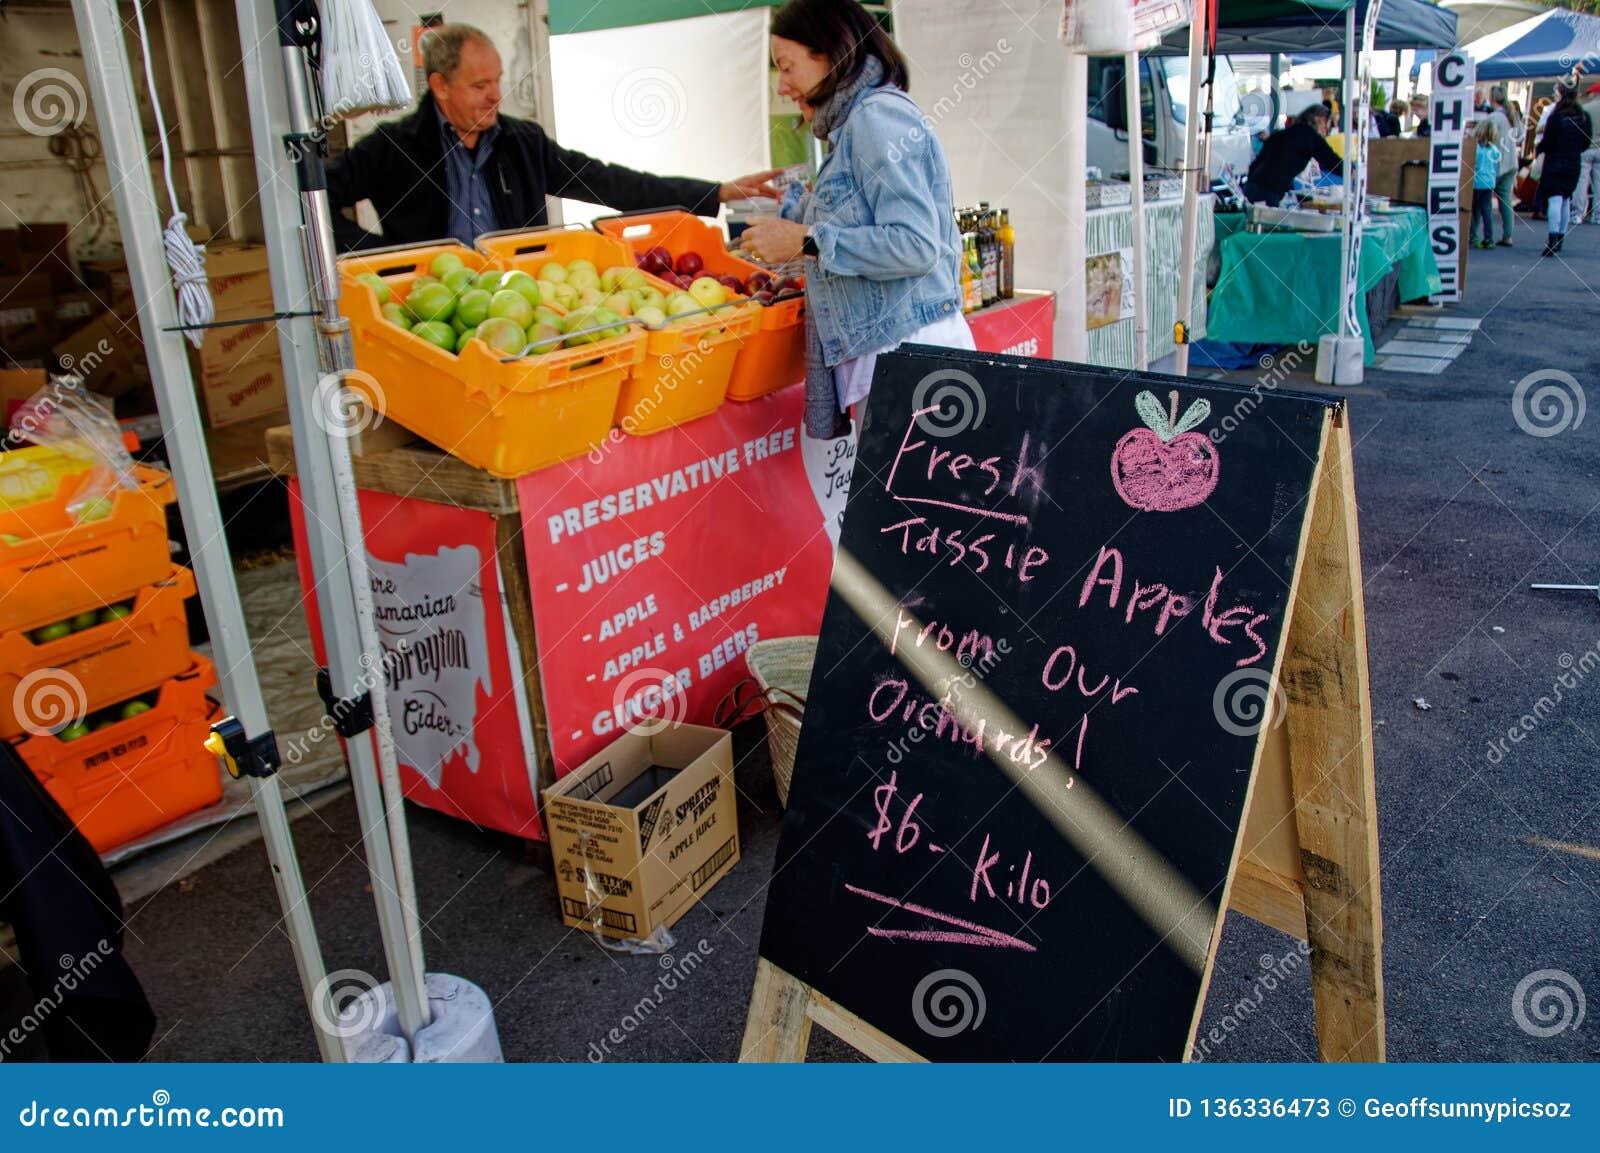 Gosford City Farmers Market Day April, 2017